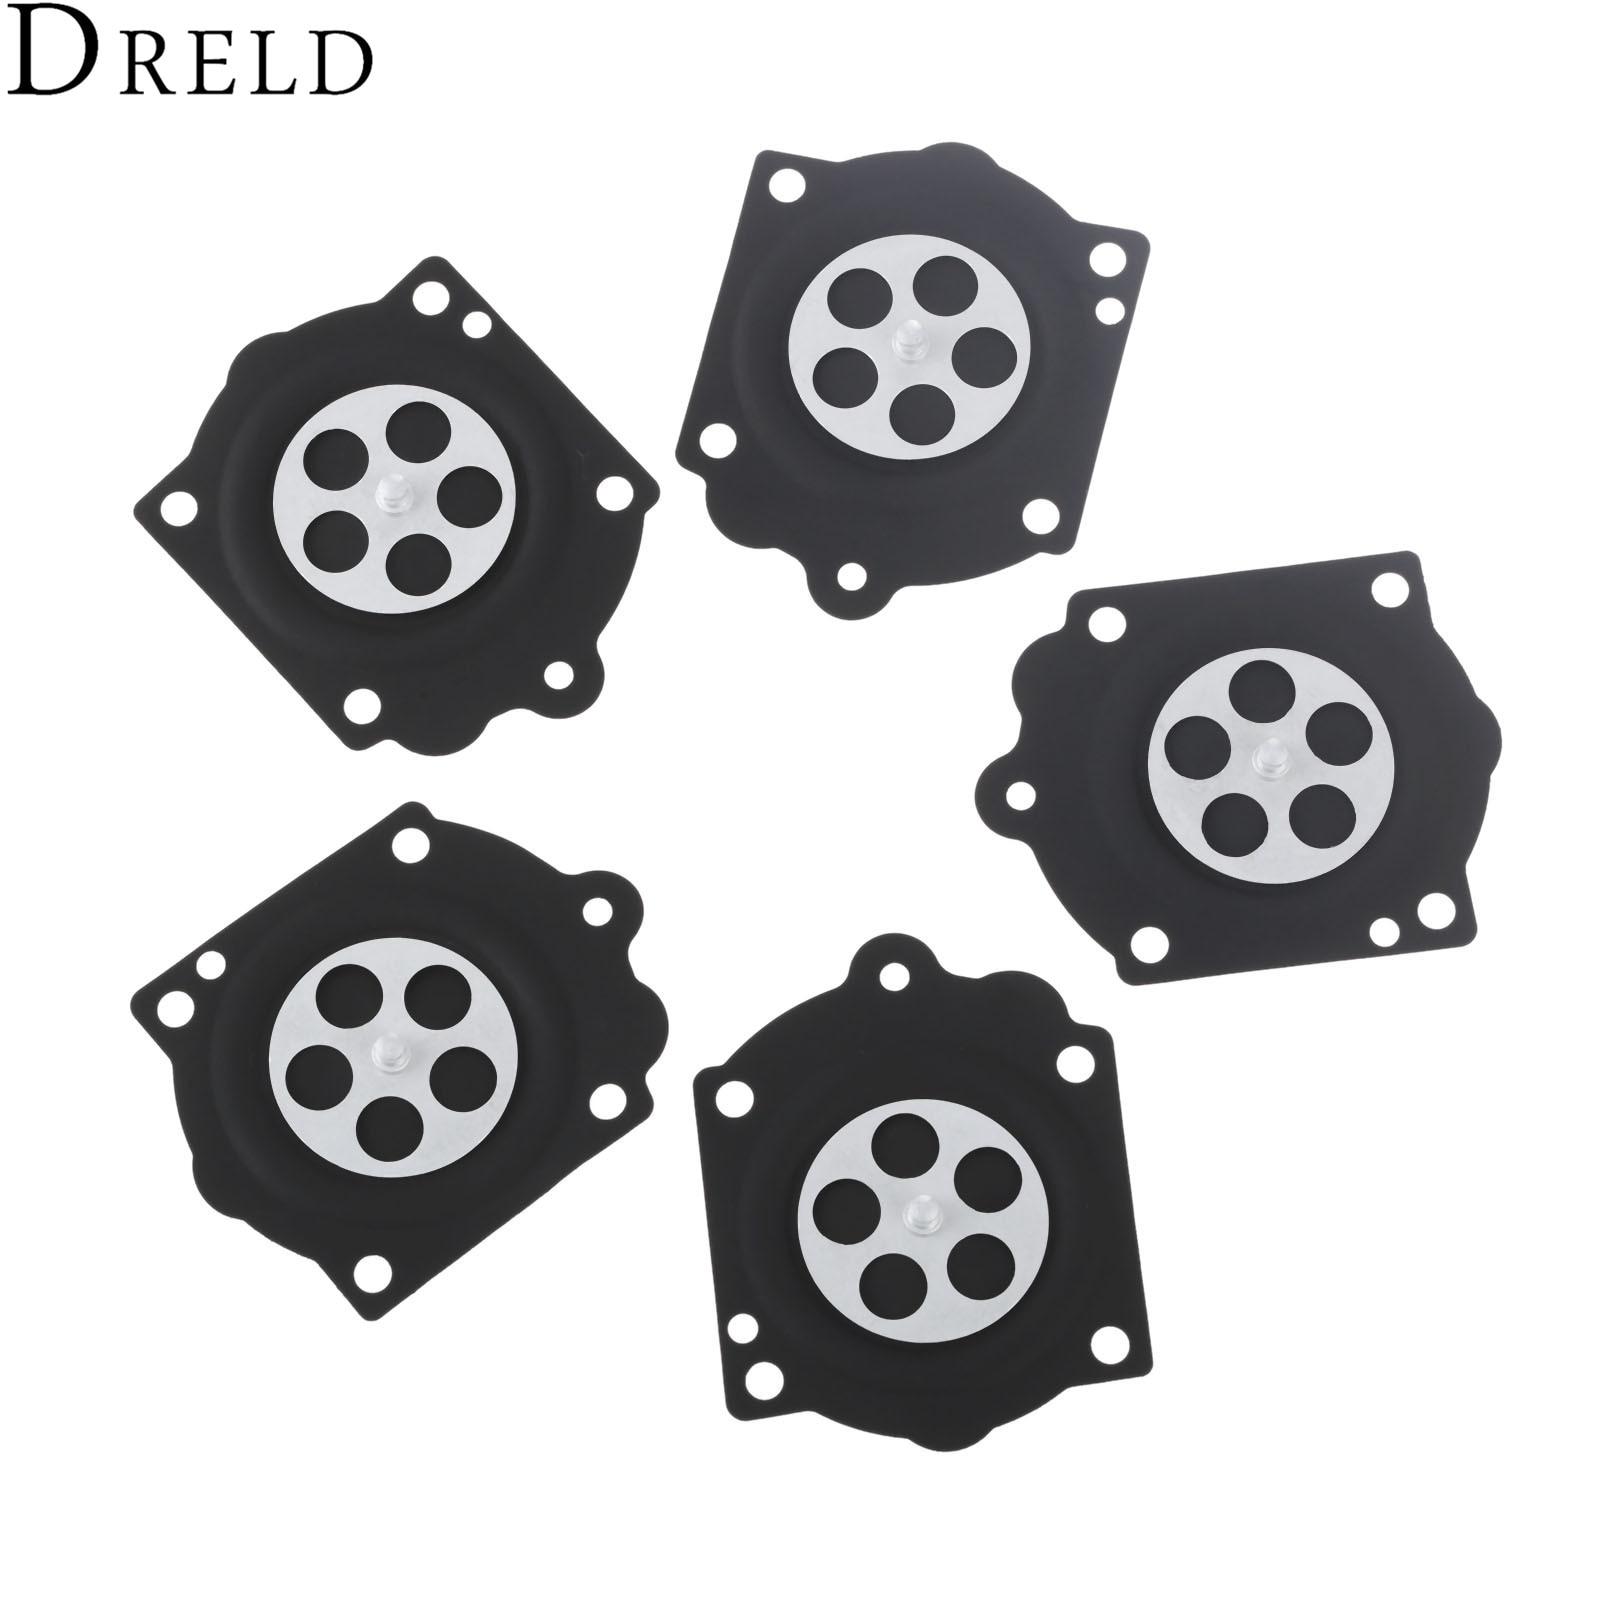 hight resolution of dreld 5pcs carburetor carb rebuild metering diaphragm kit for walbro hdb wg mcculloch pro mac 610 husq 272 ms660 chainsaw k15 wj